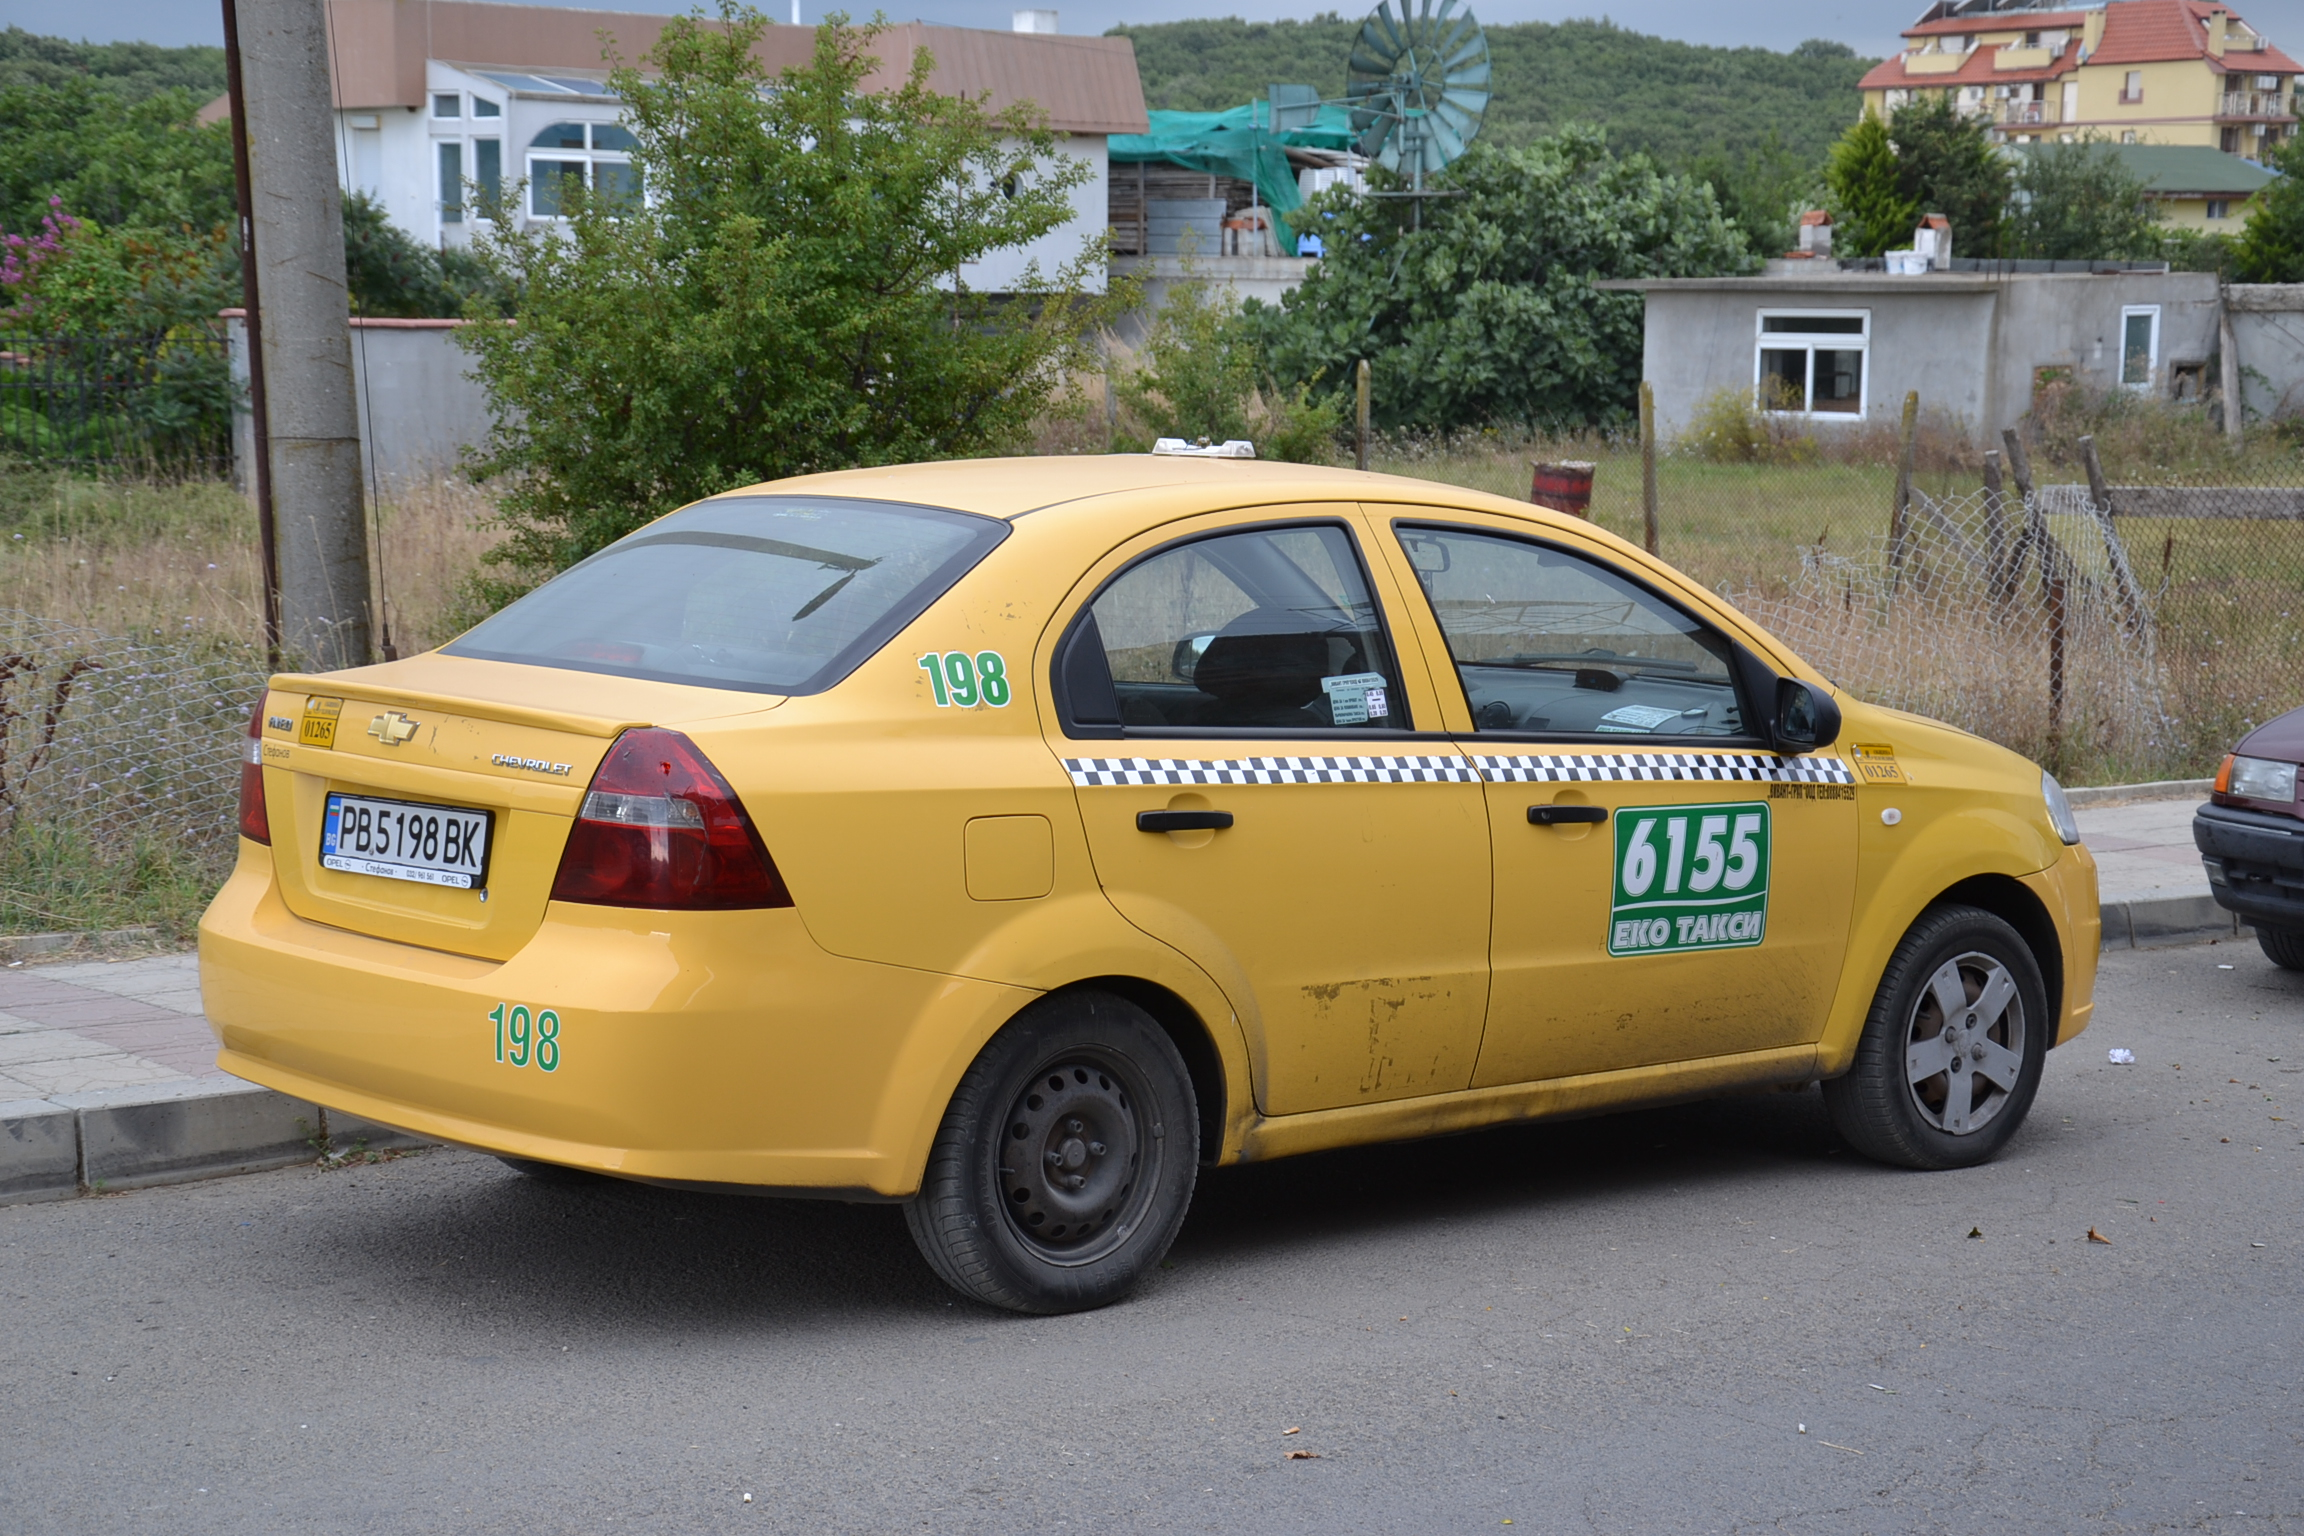 File Chevrolet Aveo Taxi Sinemorec Bul Jpg Wikimedia